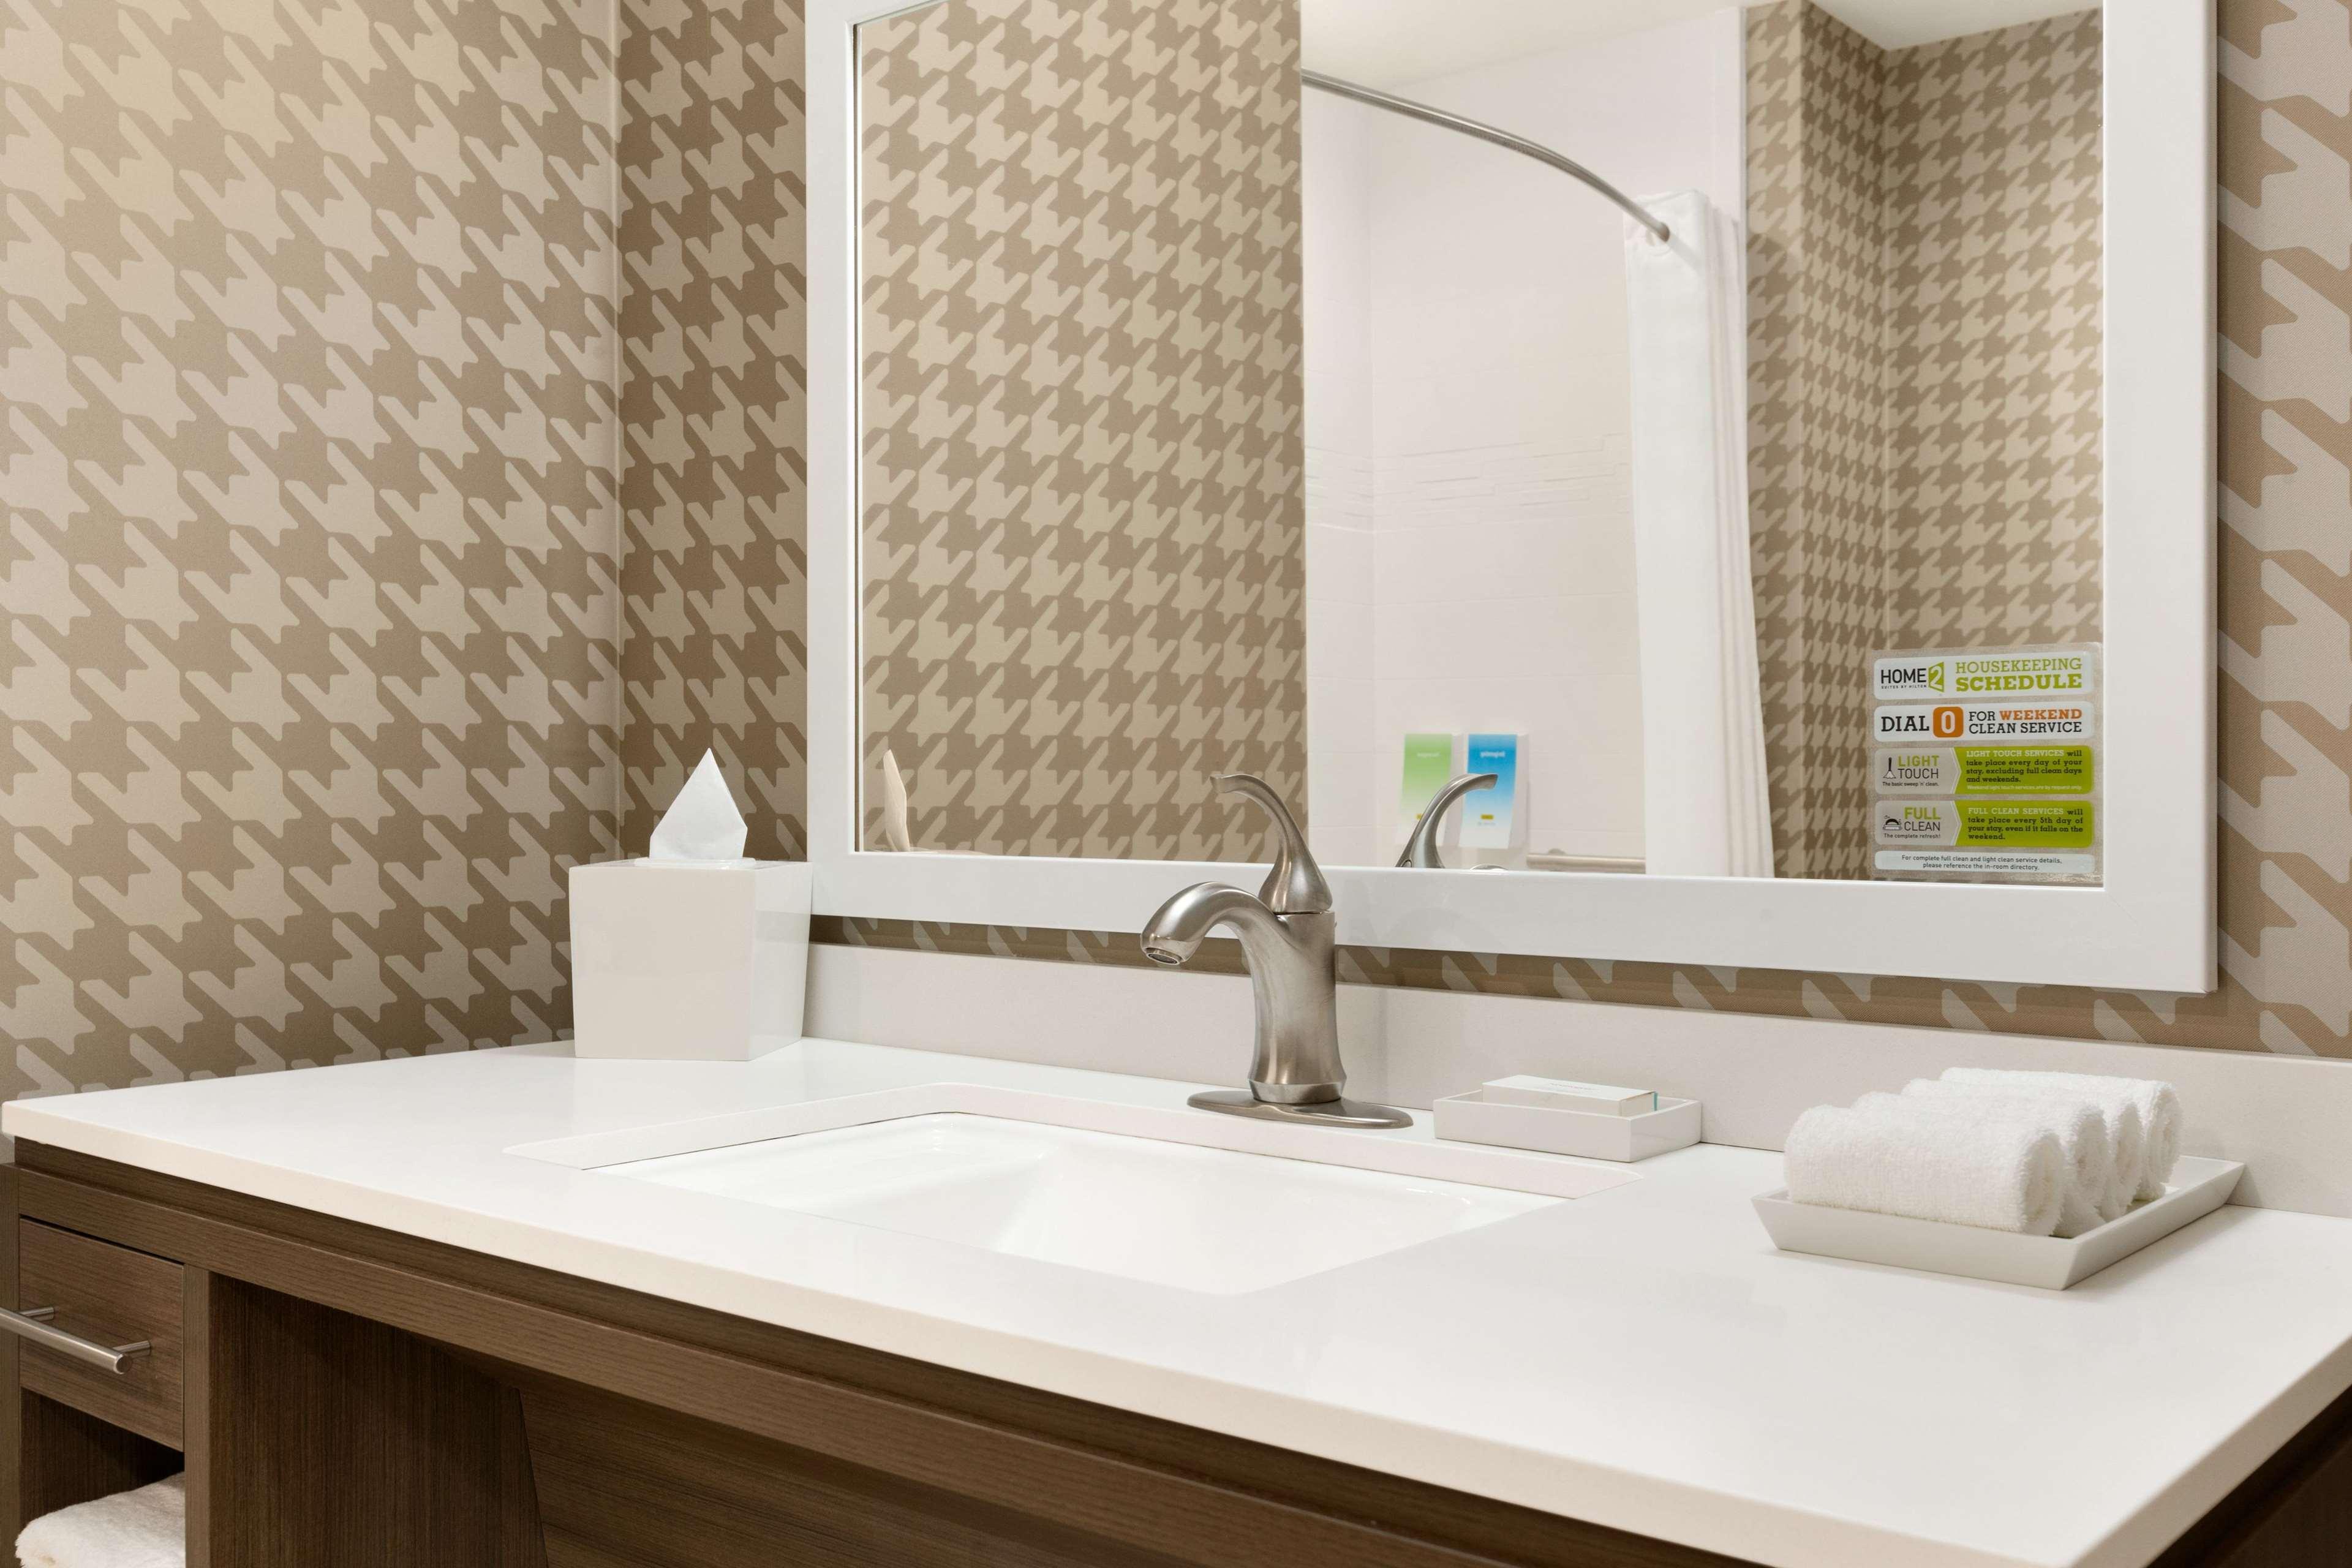 Home2 Suites by Hilton Florence Cincinnati Airport South image 24